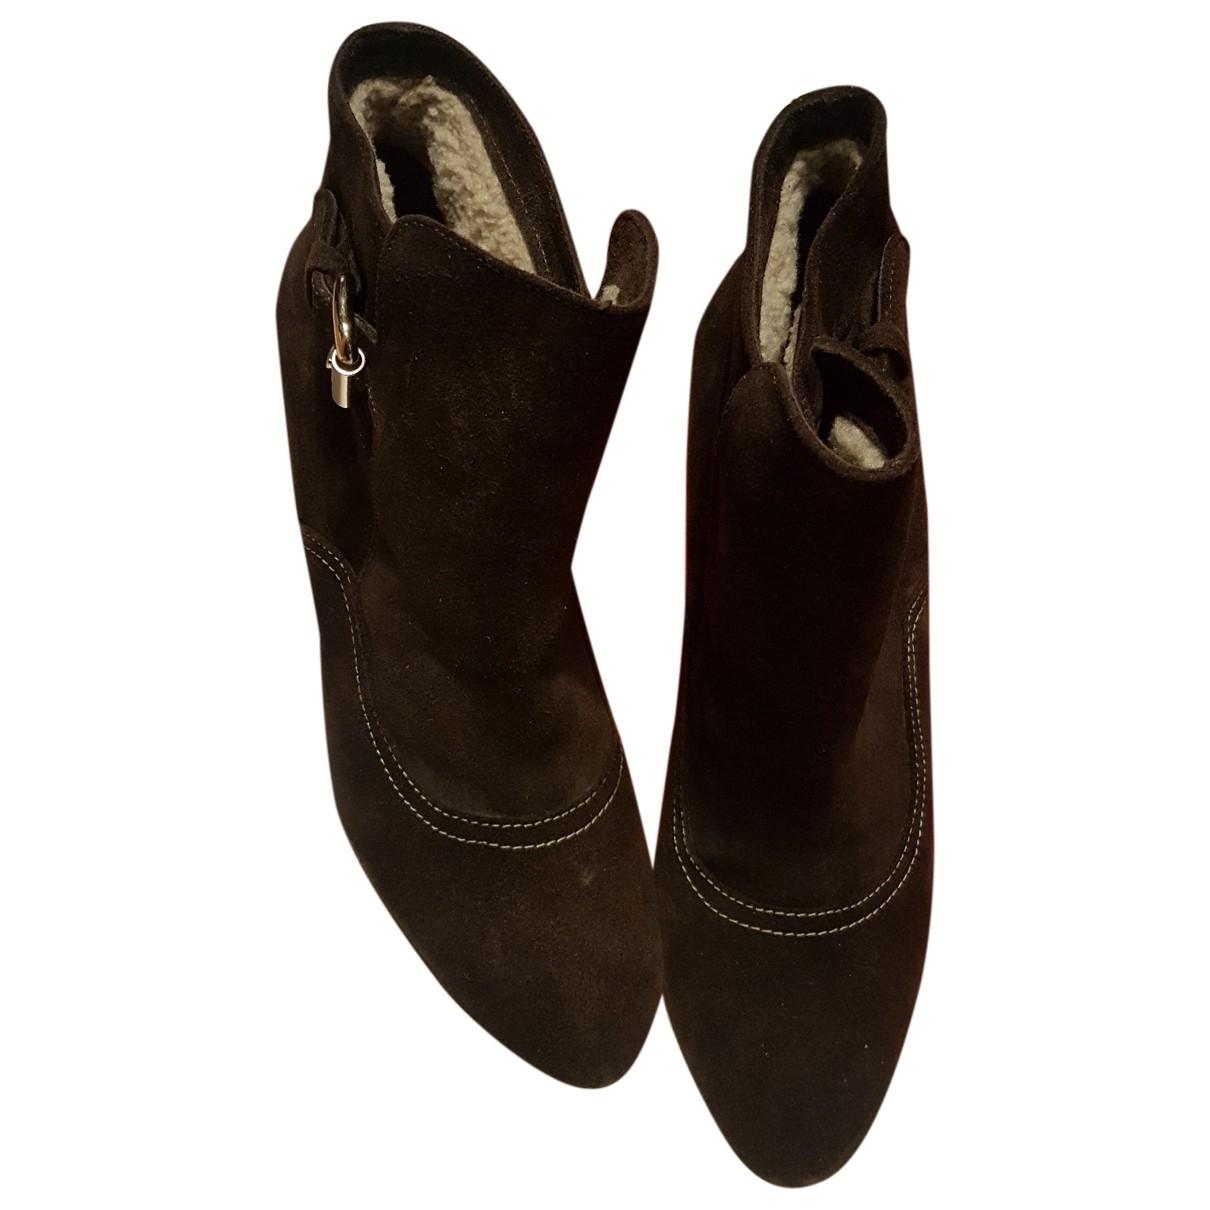 Carolina Herrera - Boots   pour femme en suede - marron